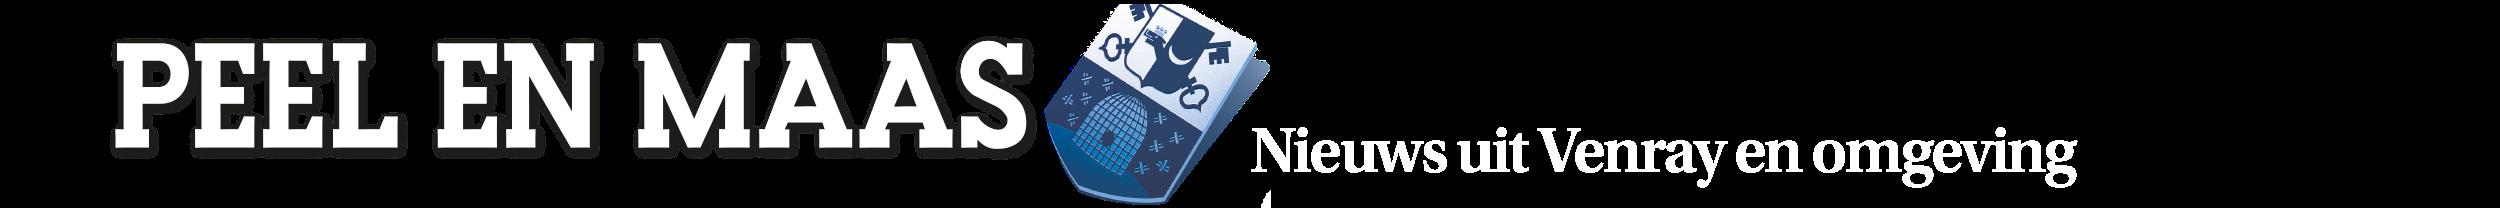 Logo peelenmaasvenray.nl